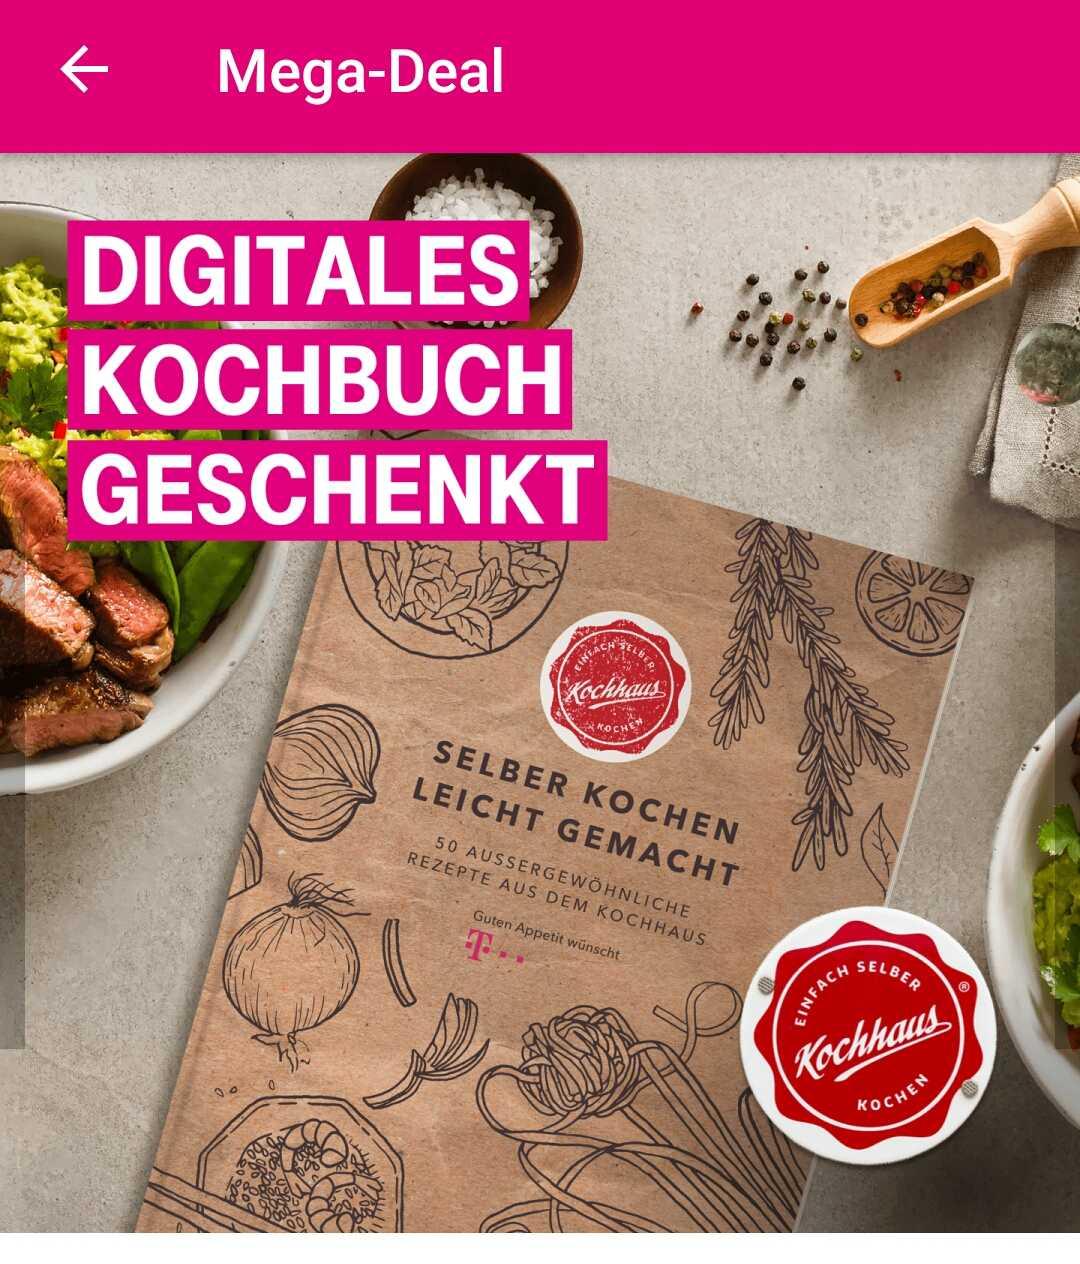 gratis kochbuch als download fuer telekom kunden megadeal